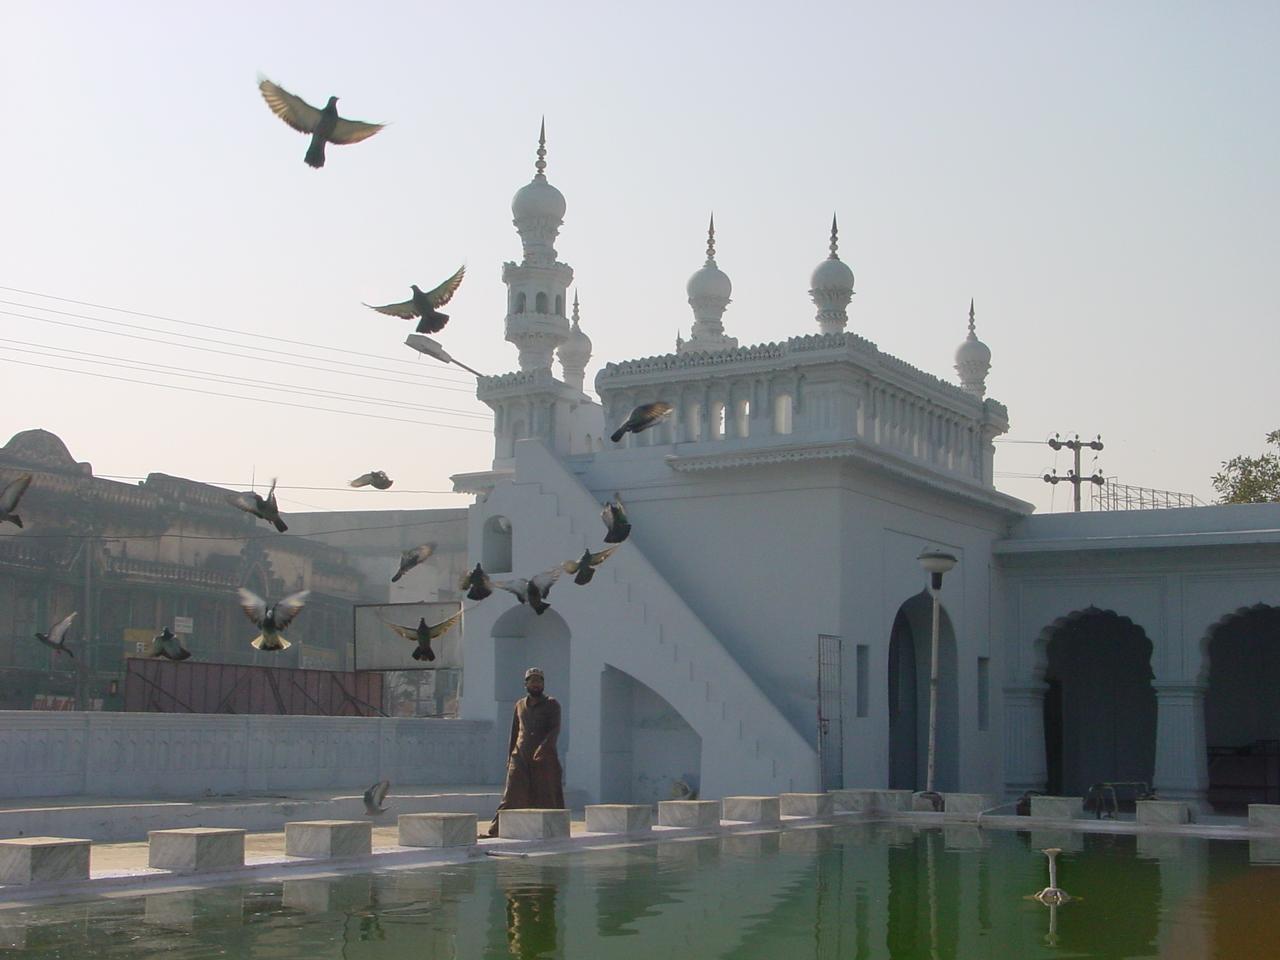 Une mosquée (photo Clarisse BROCHIER)